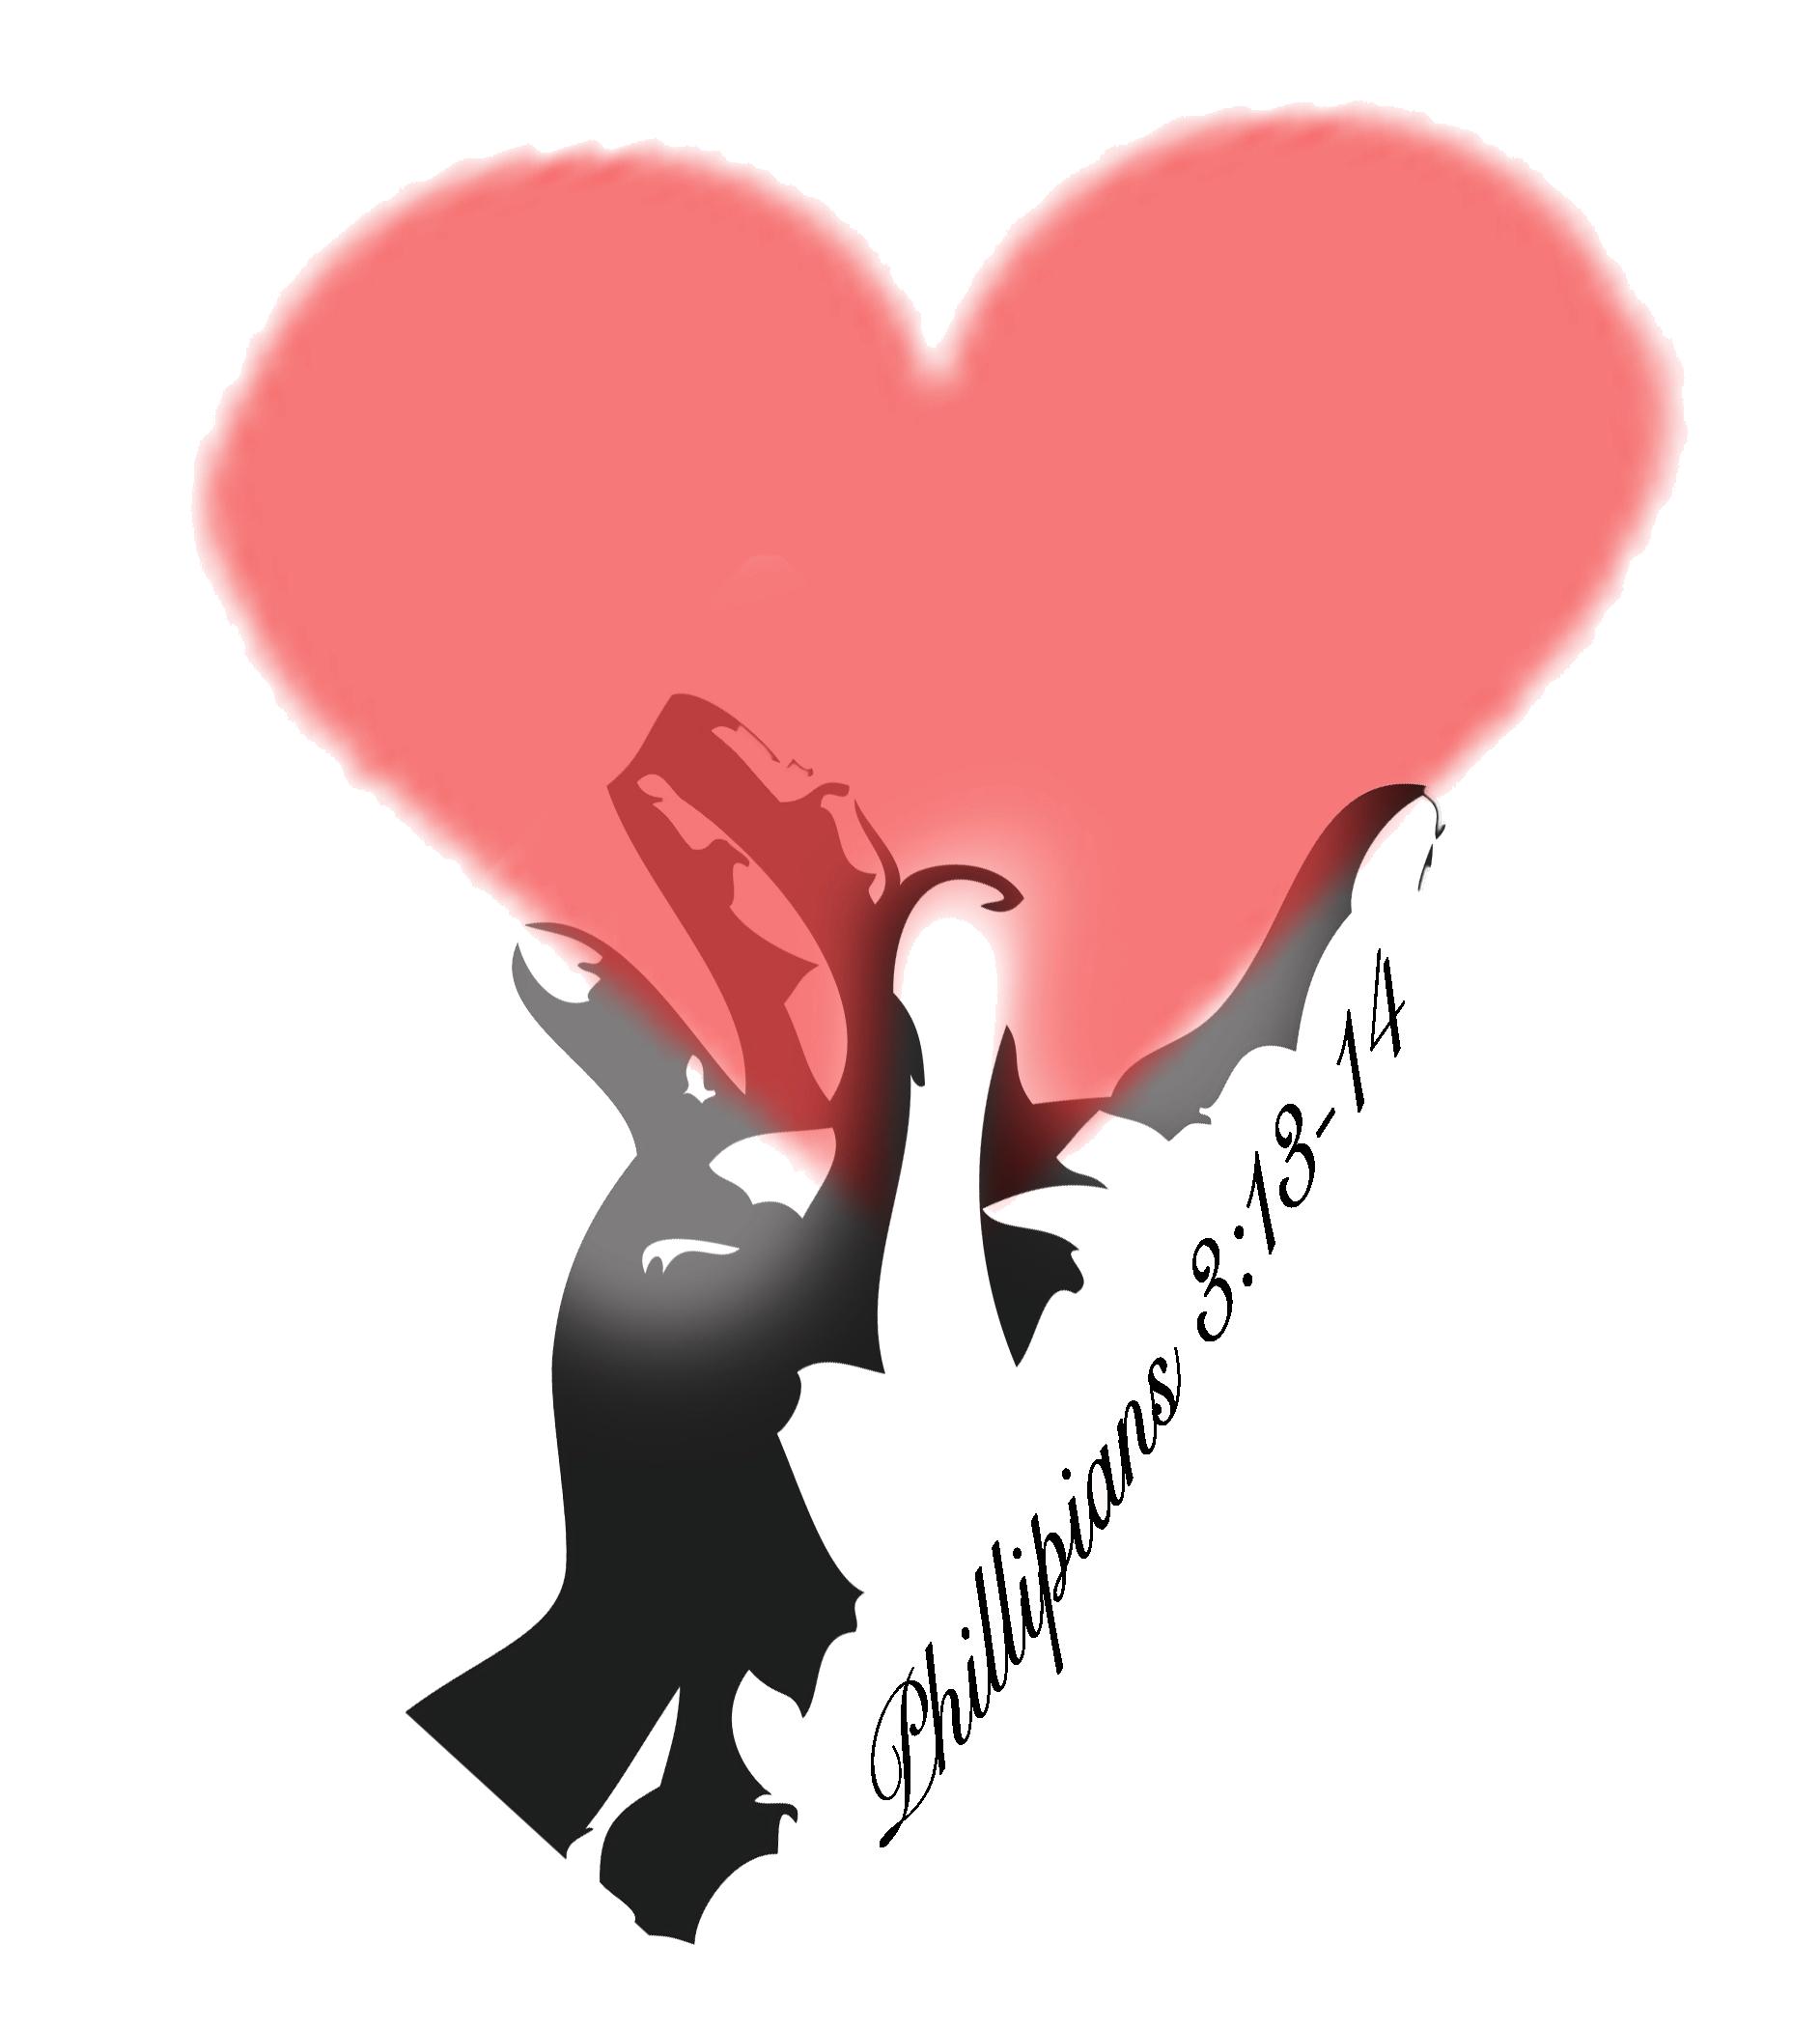 Love clipart love theme, Love love theme Transparent FREE.